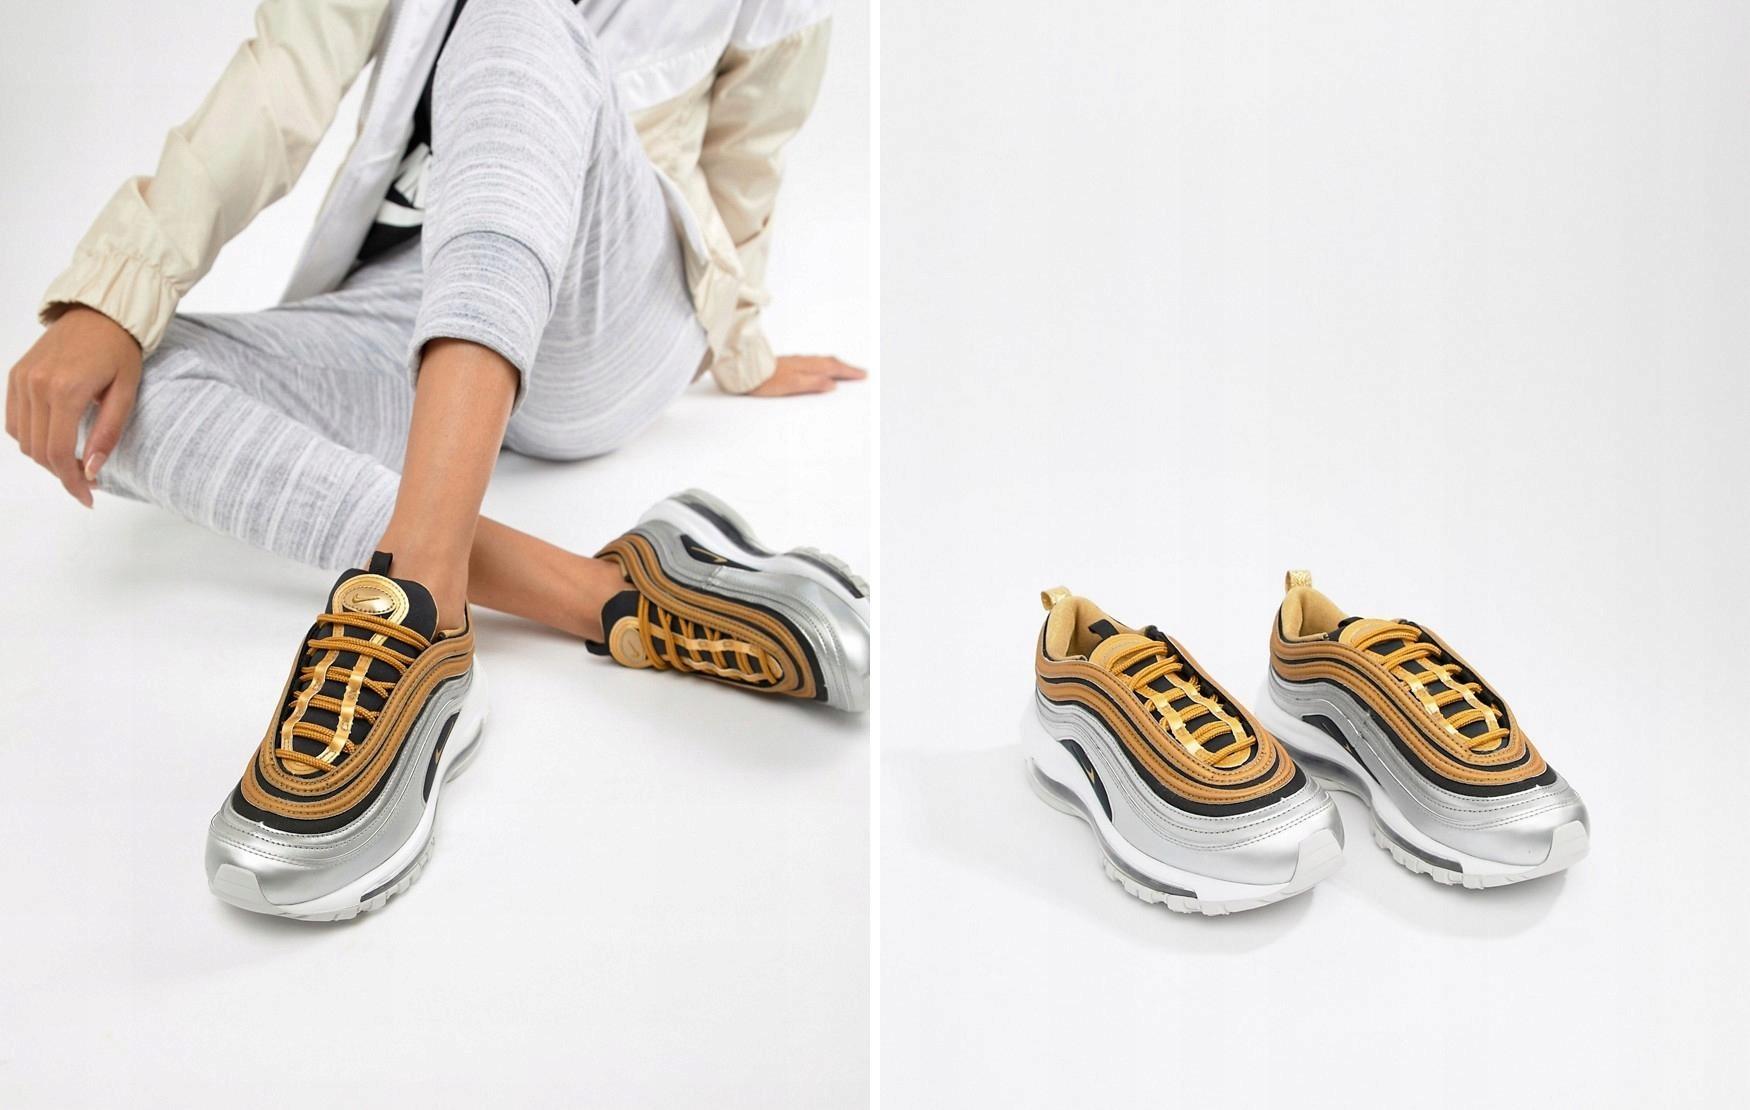 buty nike air max 97 złote